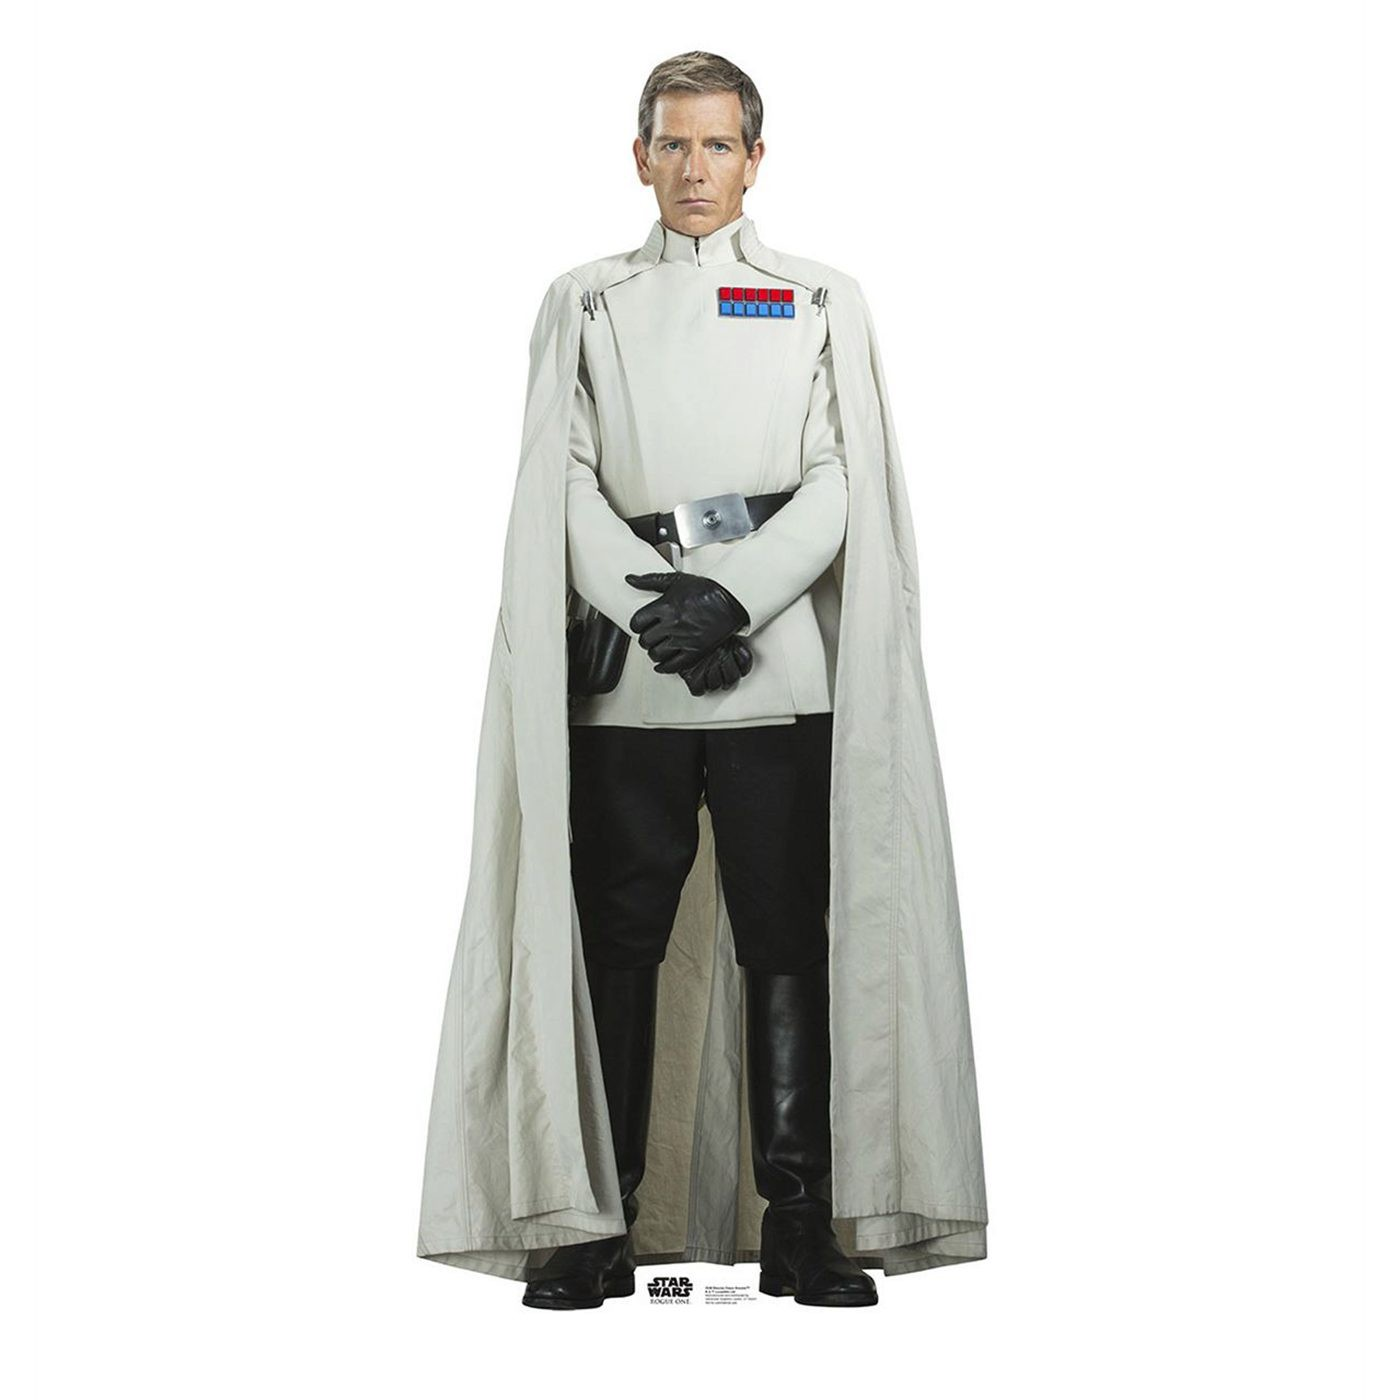 Star Wars Rogue One Director Orson Krennic Cutout